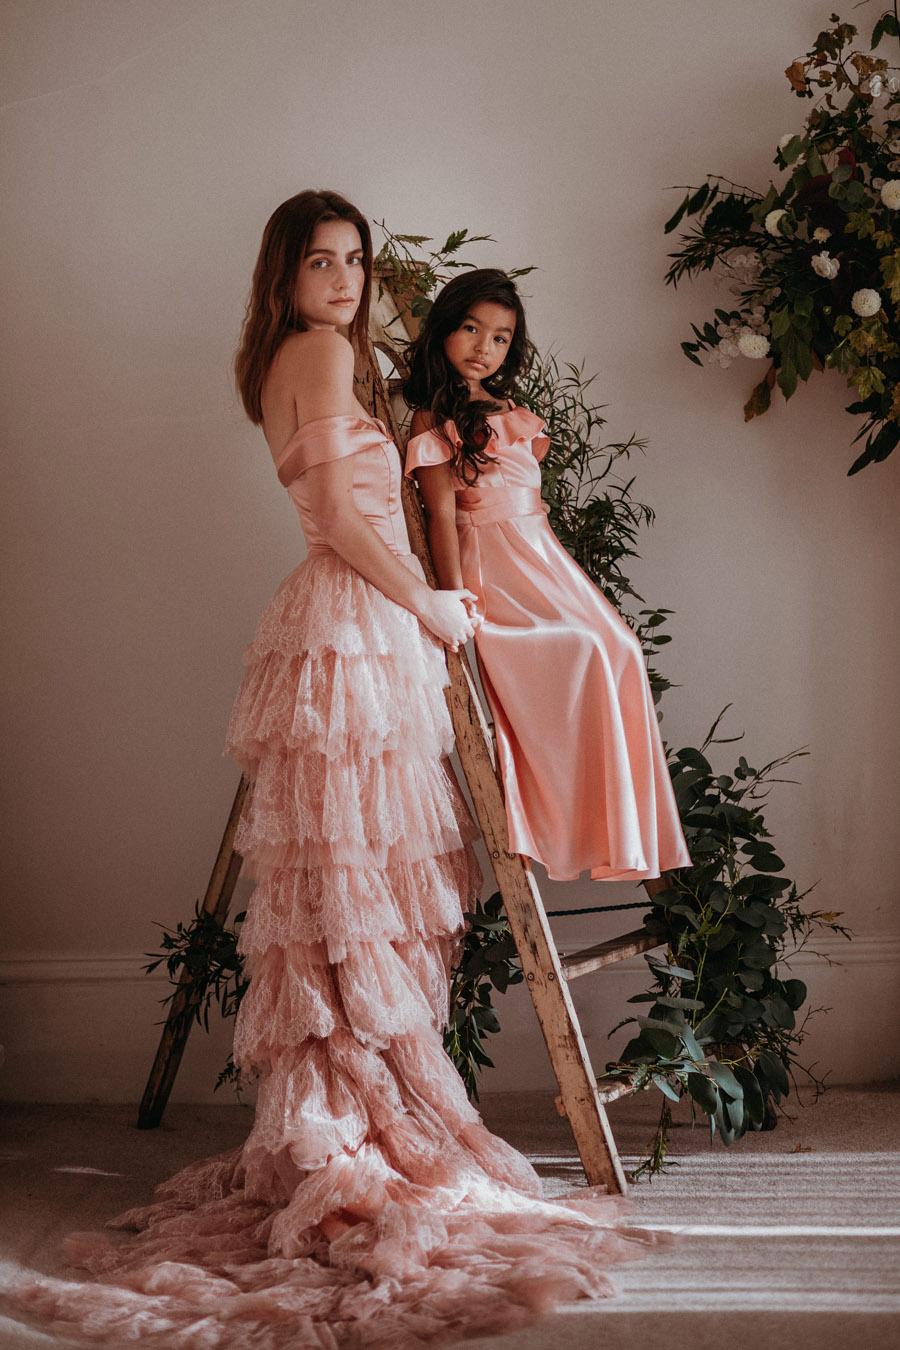 Sanyukta Shrestha autumn daydream bridal collection 2020 (34)